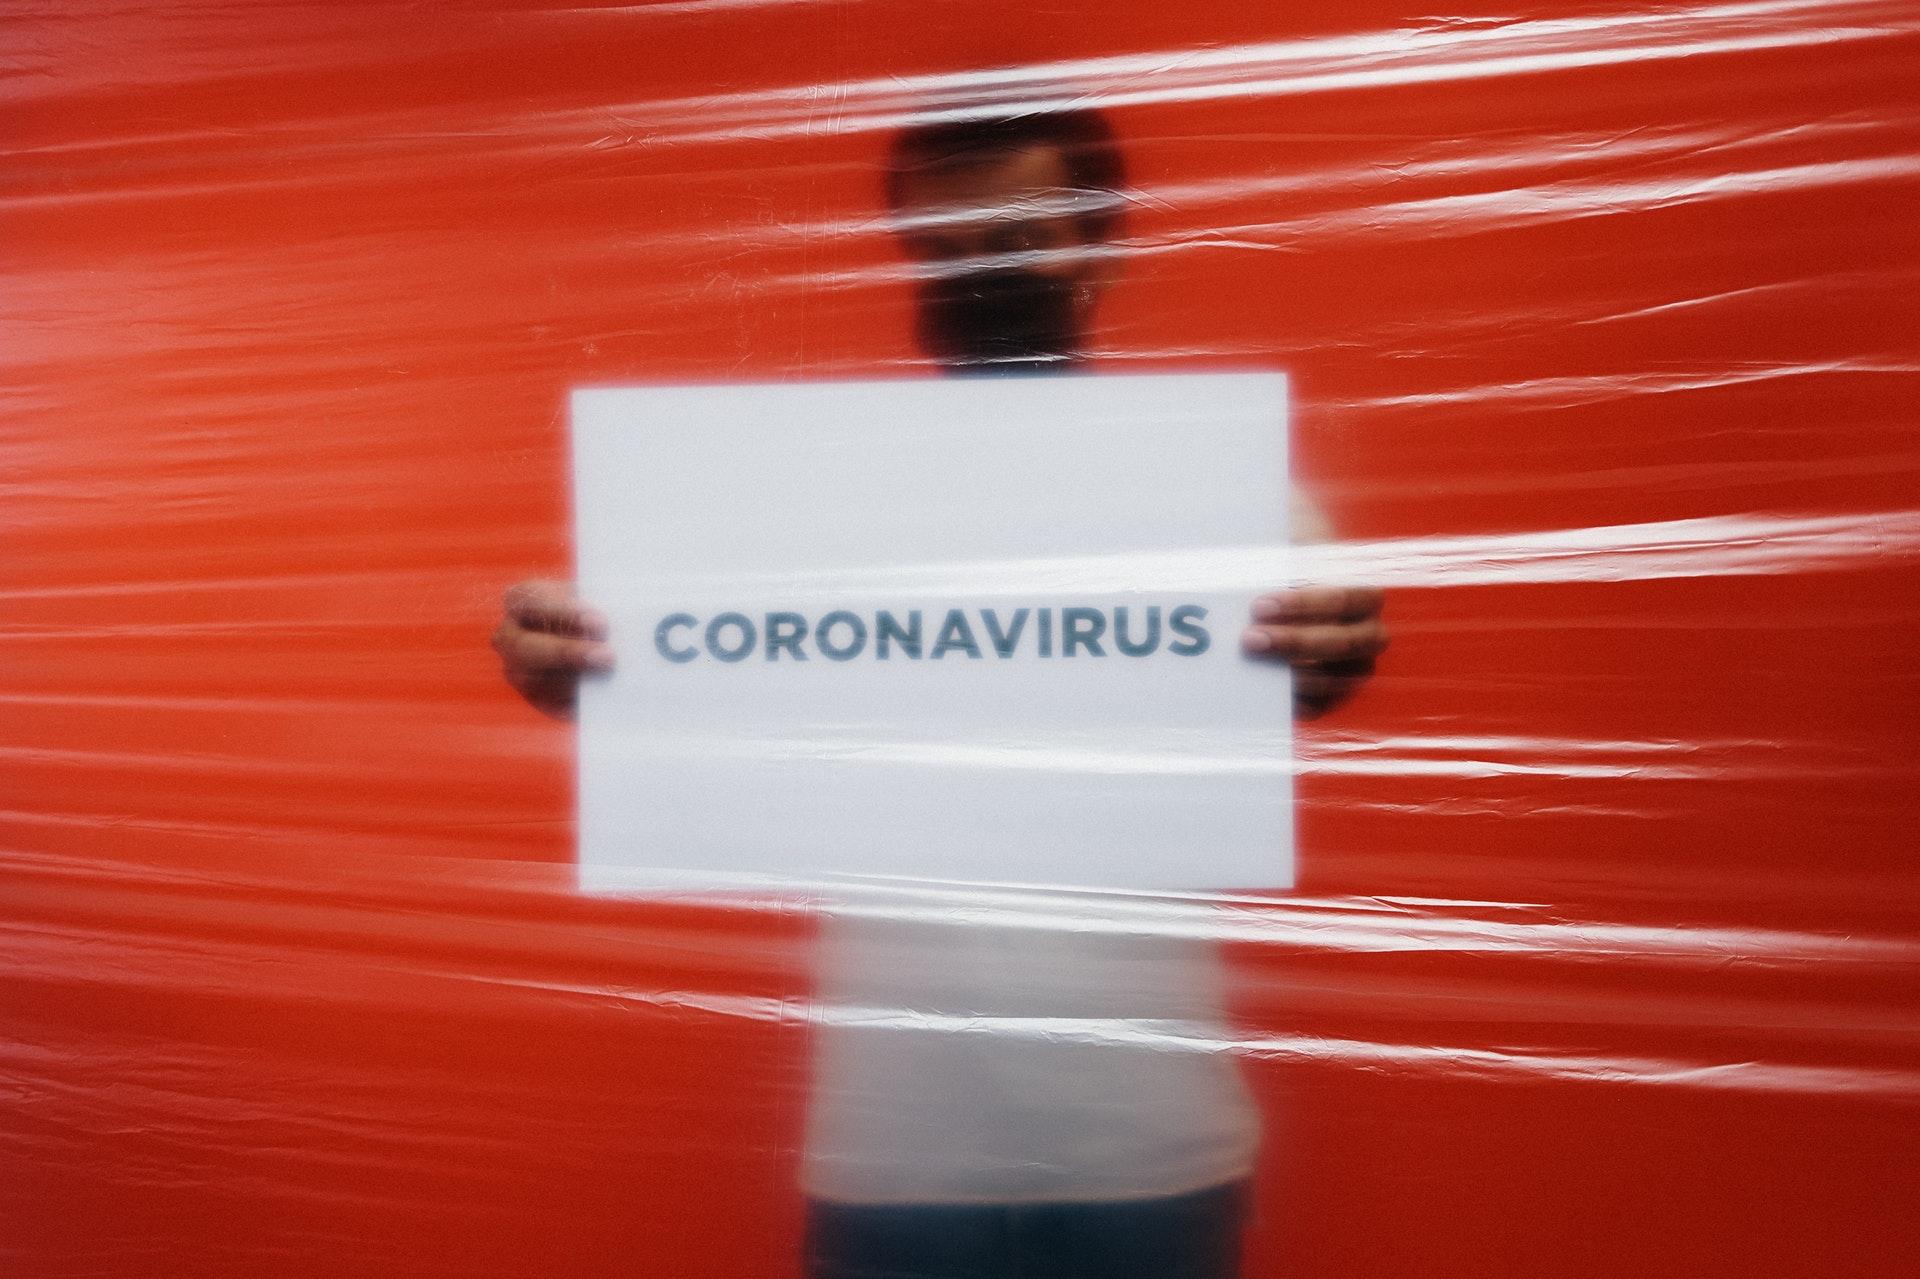 Coronavirus e rientro in Italia